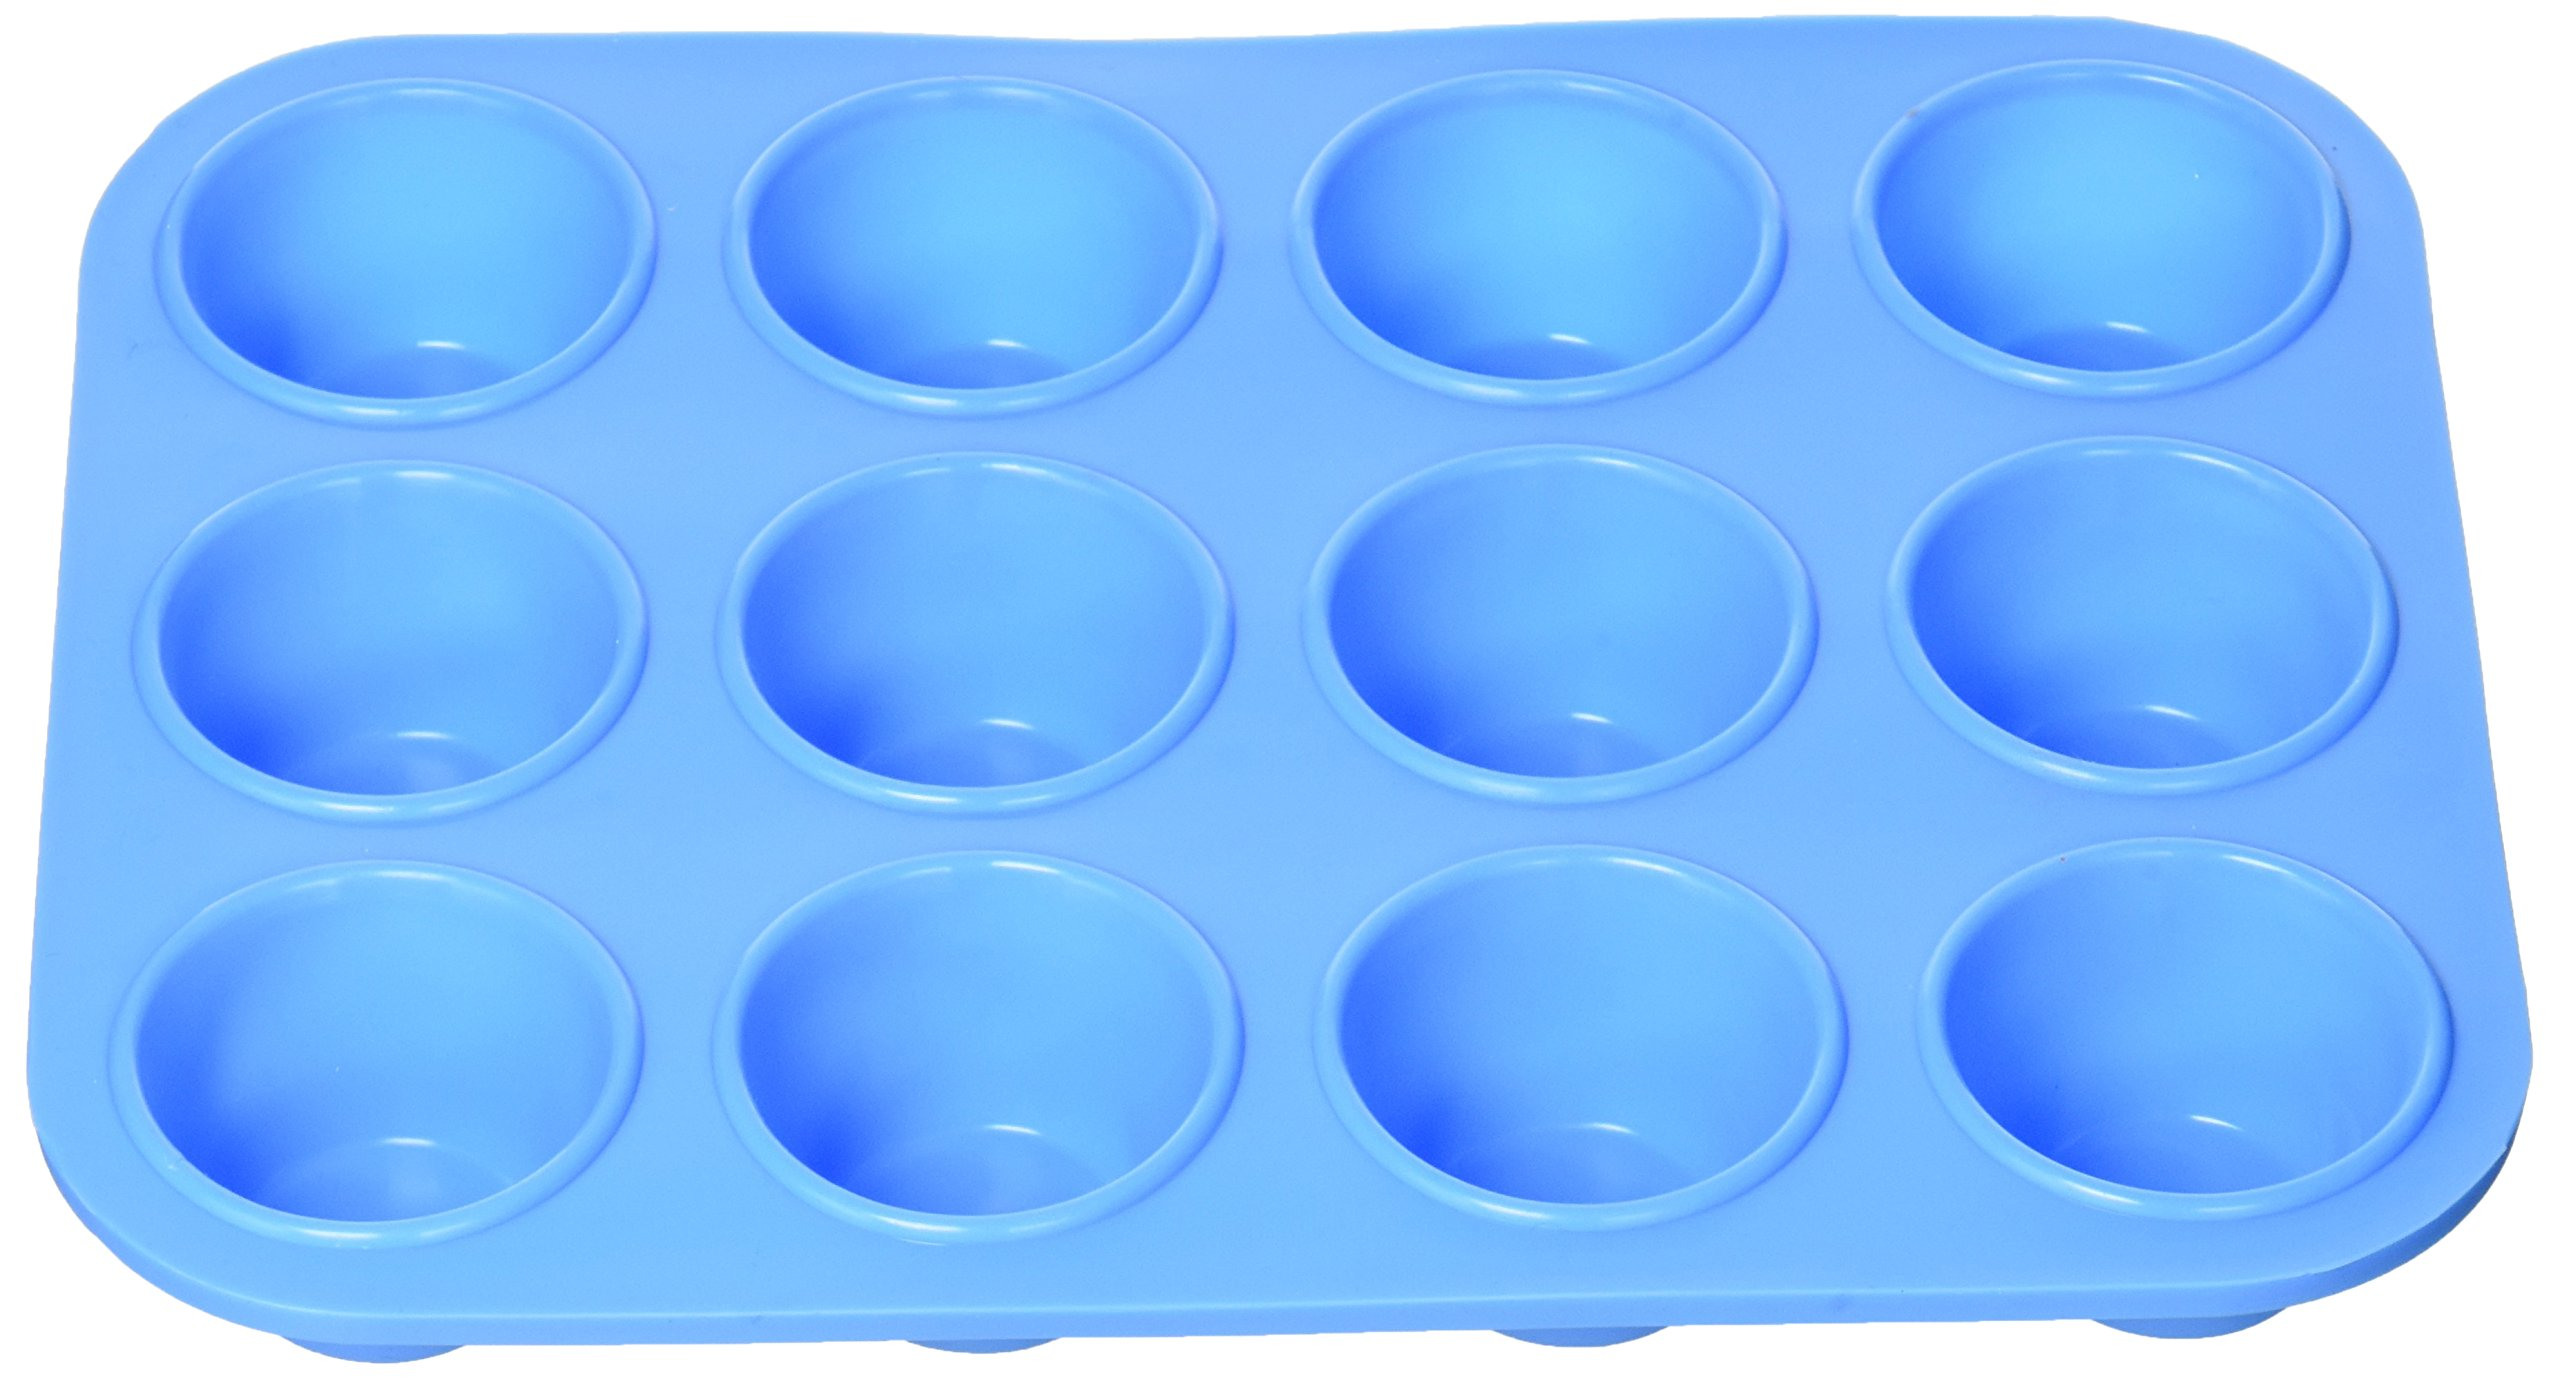 bulk buys OL462 Silicone Mini Muffin Tray, Natural